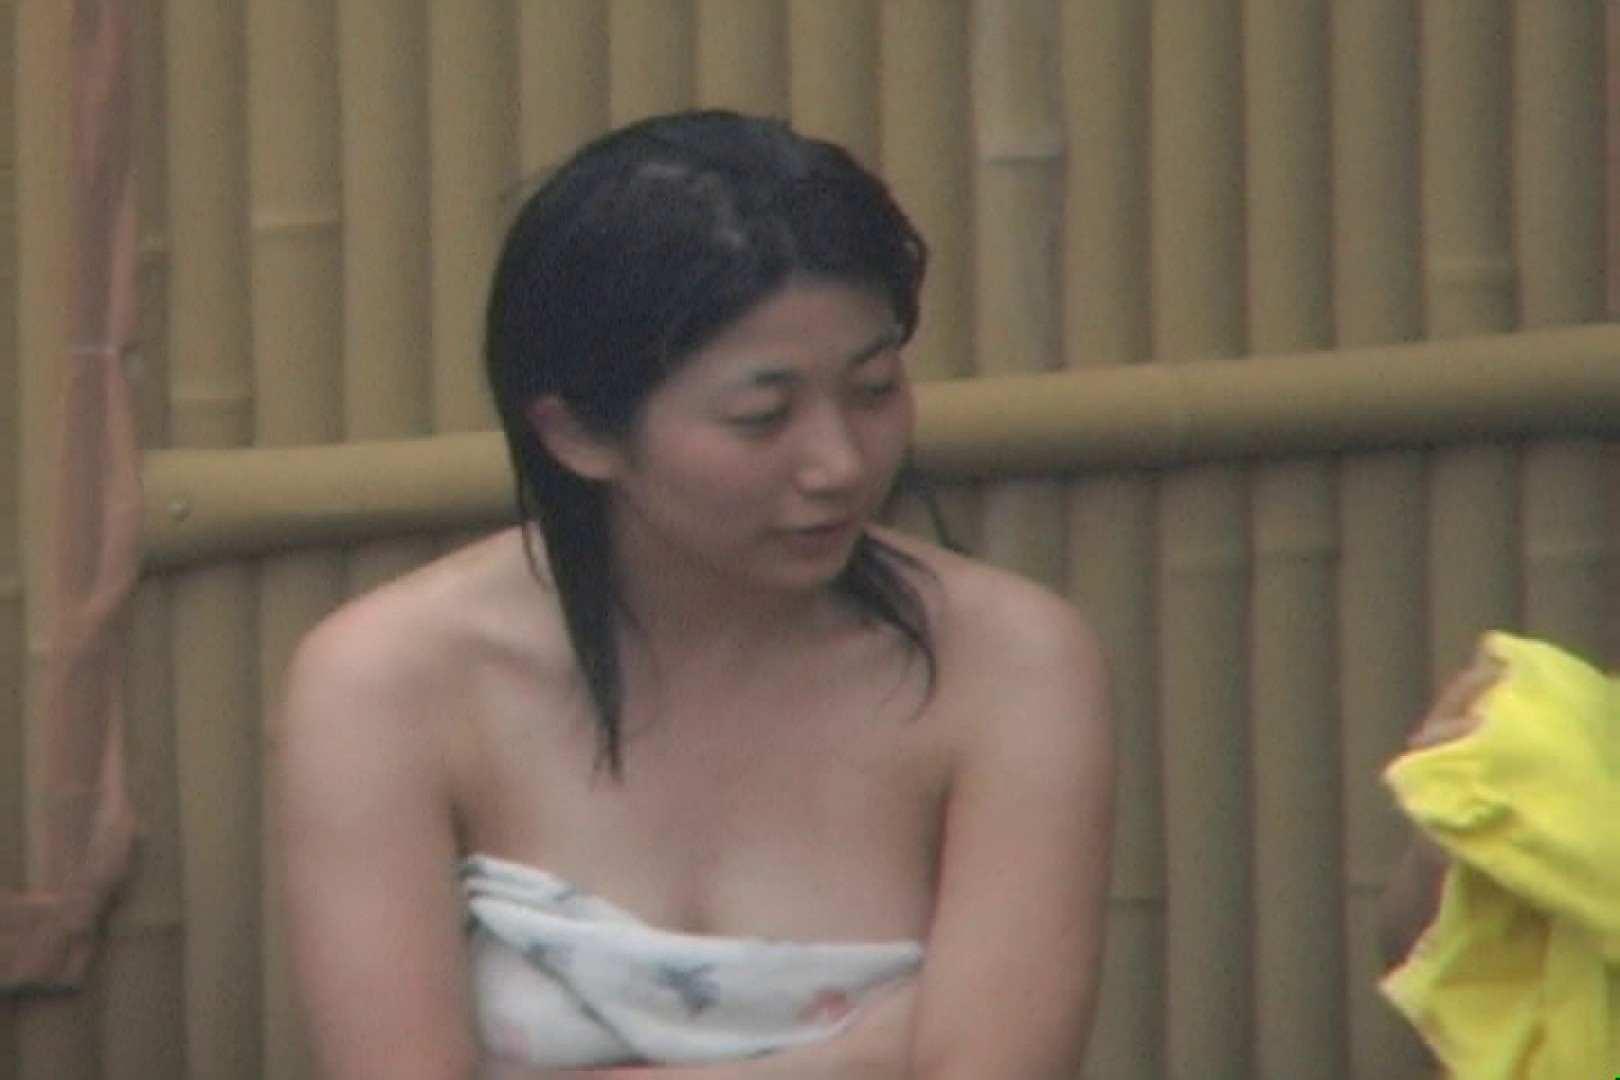 Aquaな露天風呂Vol.43【VIP限定】 露天 のぞき動画画像 88画像 5